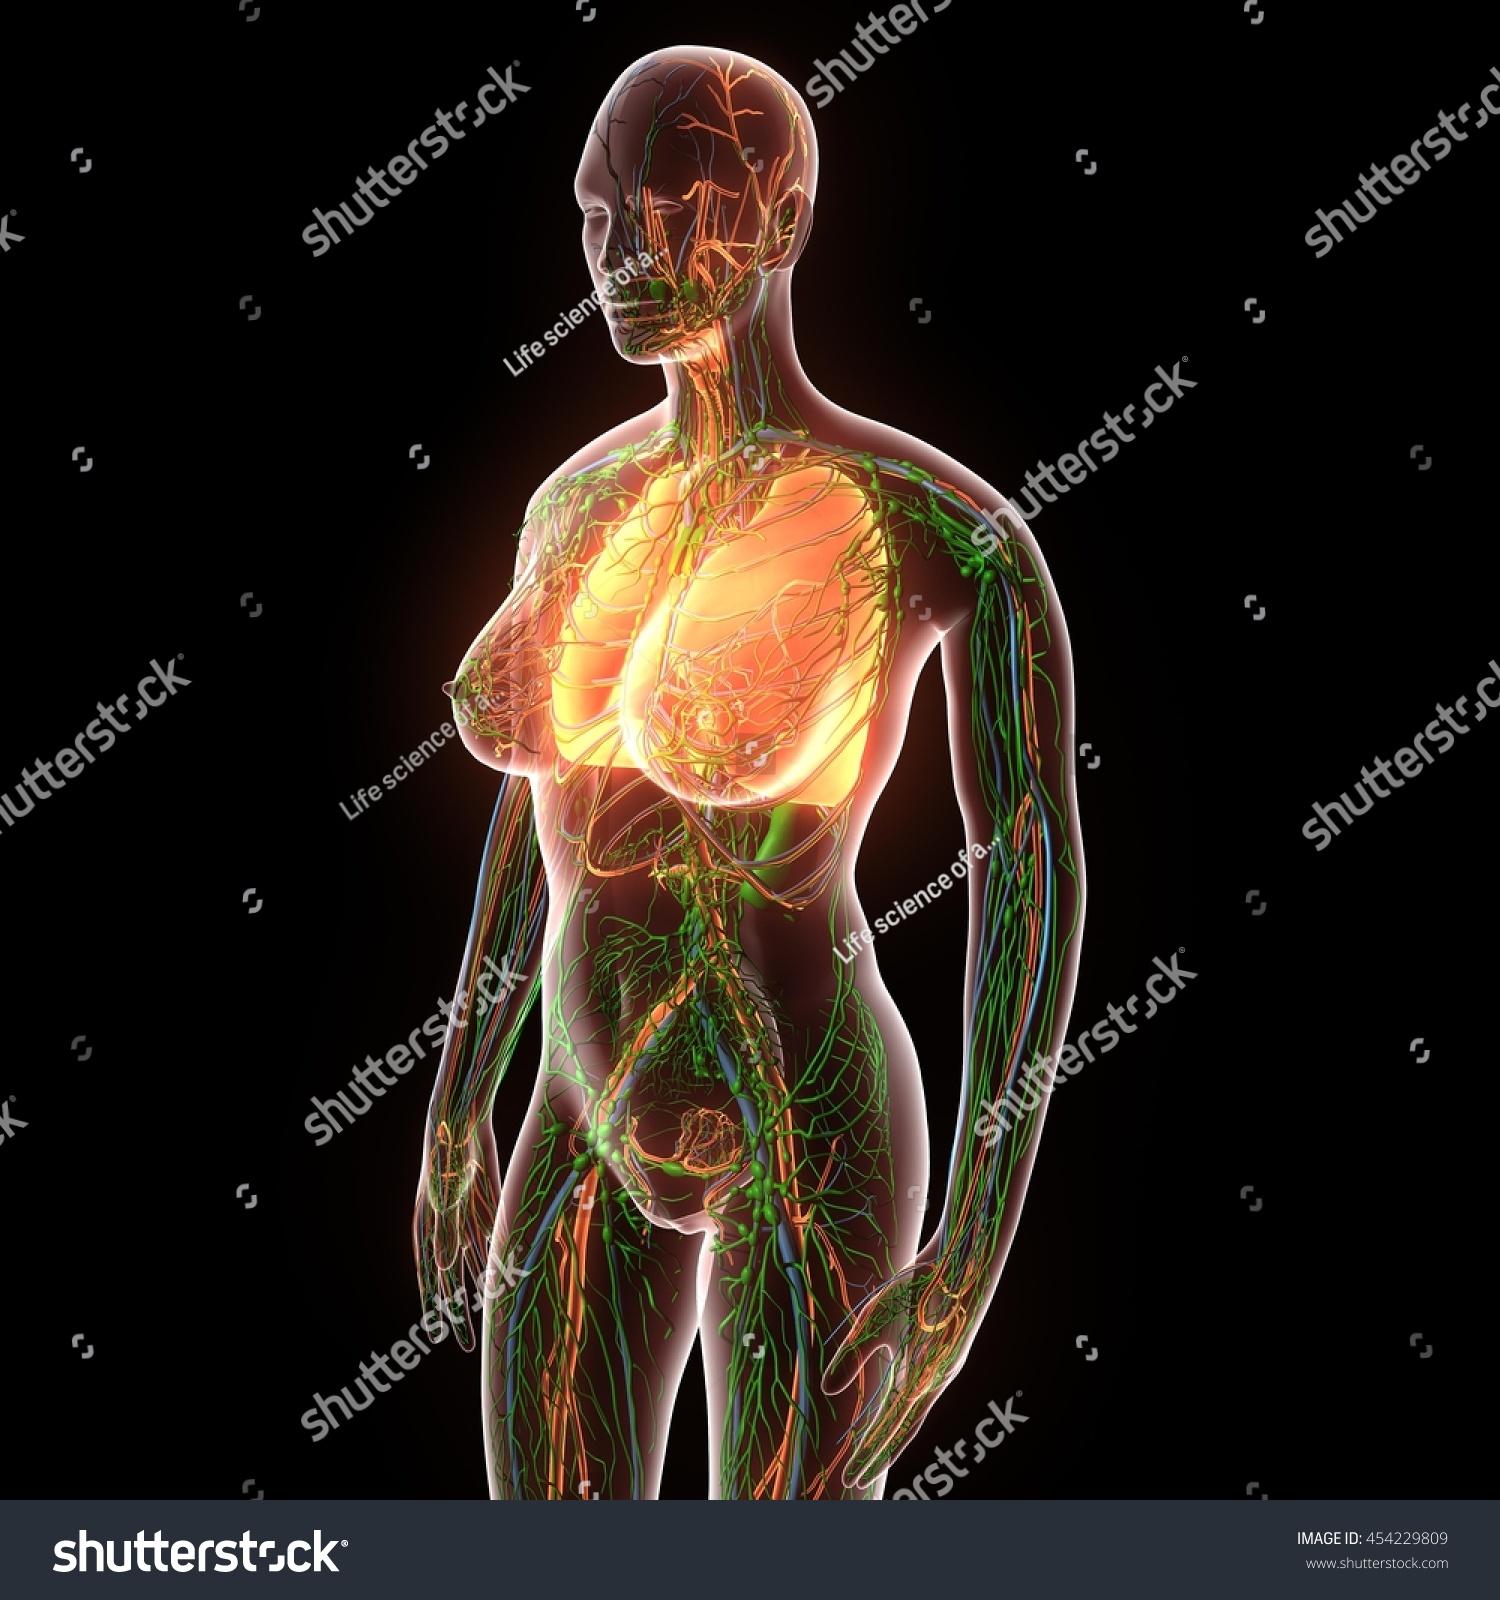 Female Human Body Organs Lungs Anatomy Stock Illustration 454229809